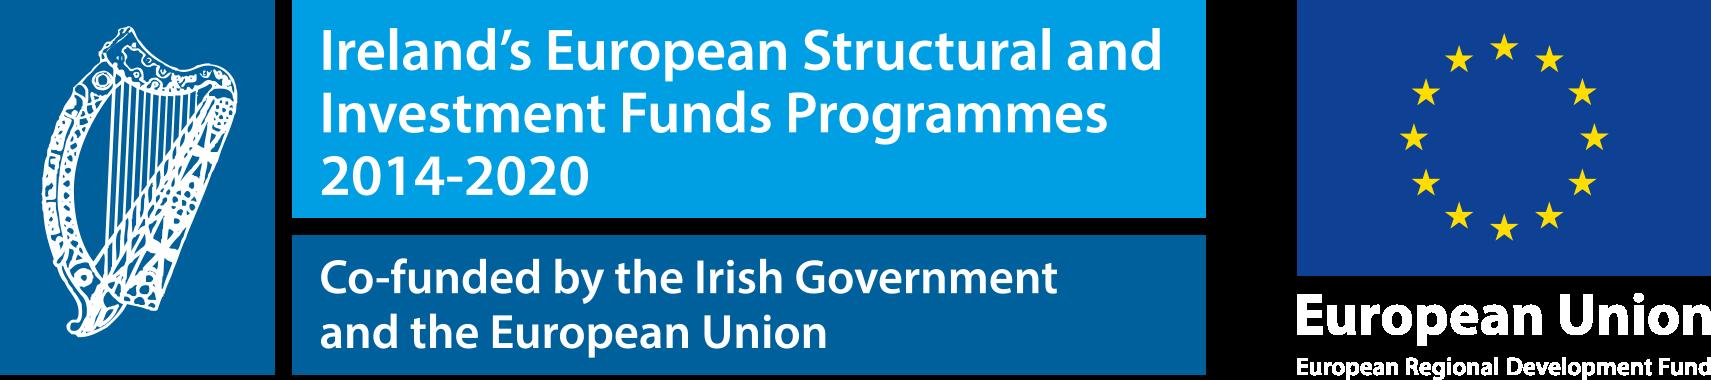 EU funding logos